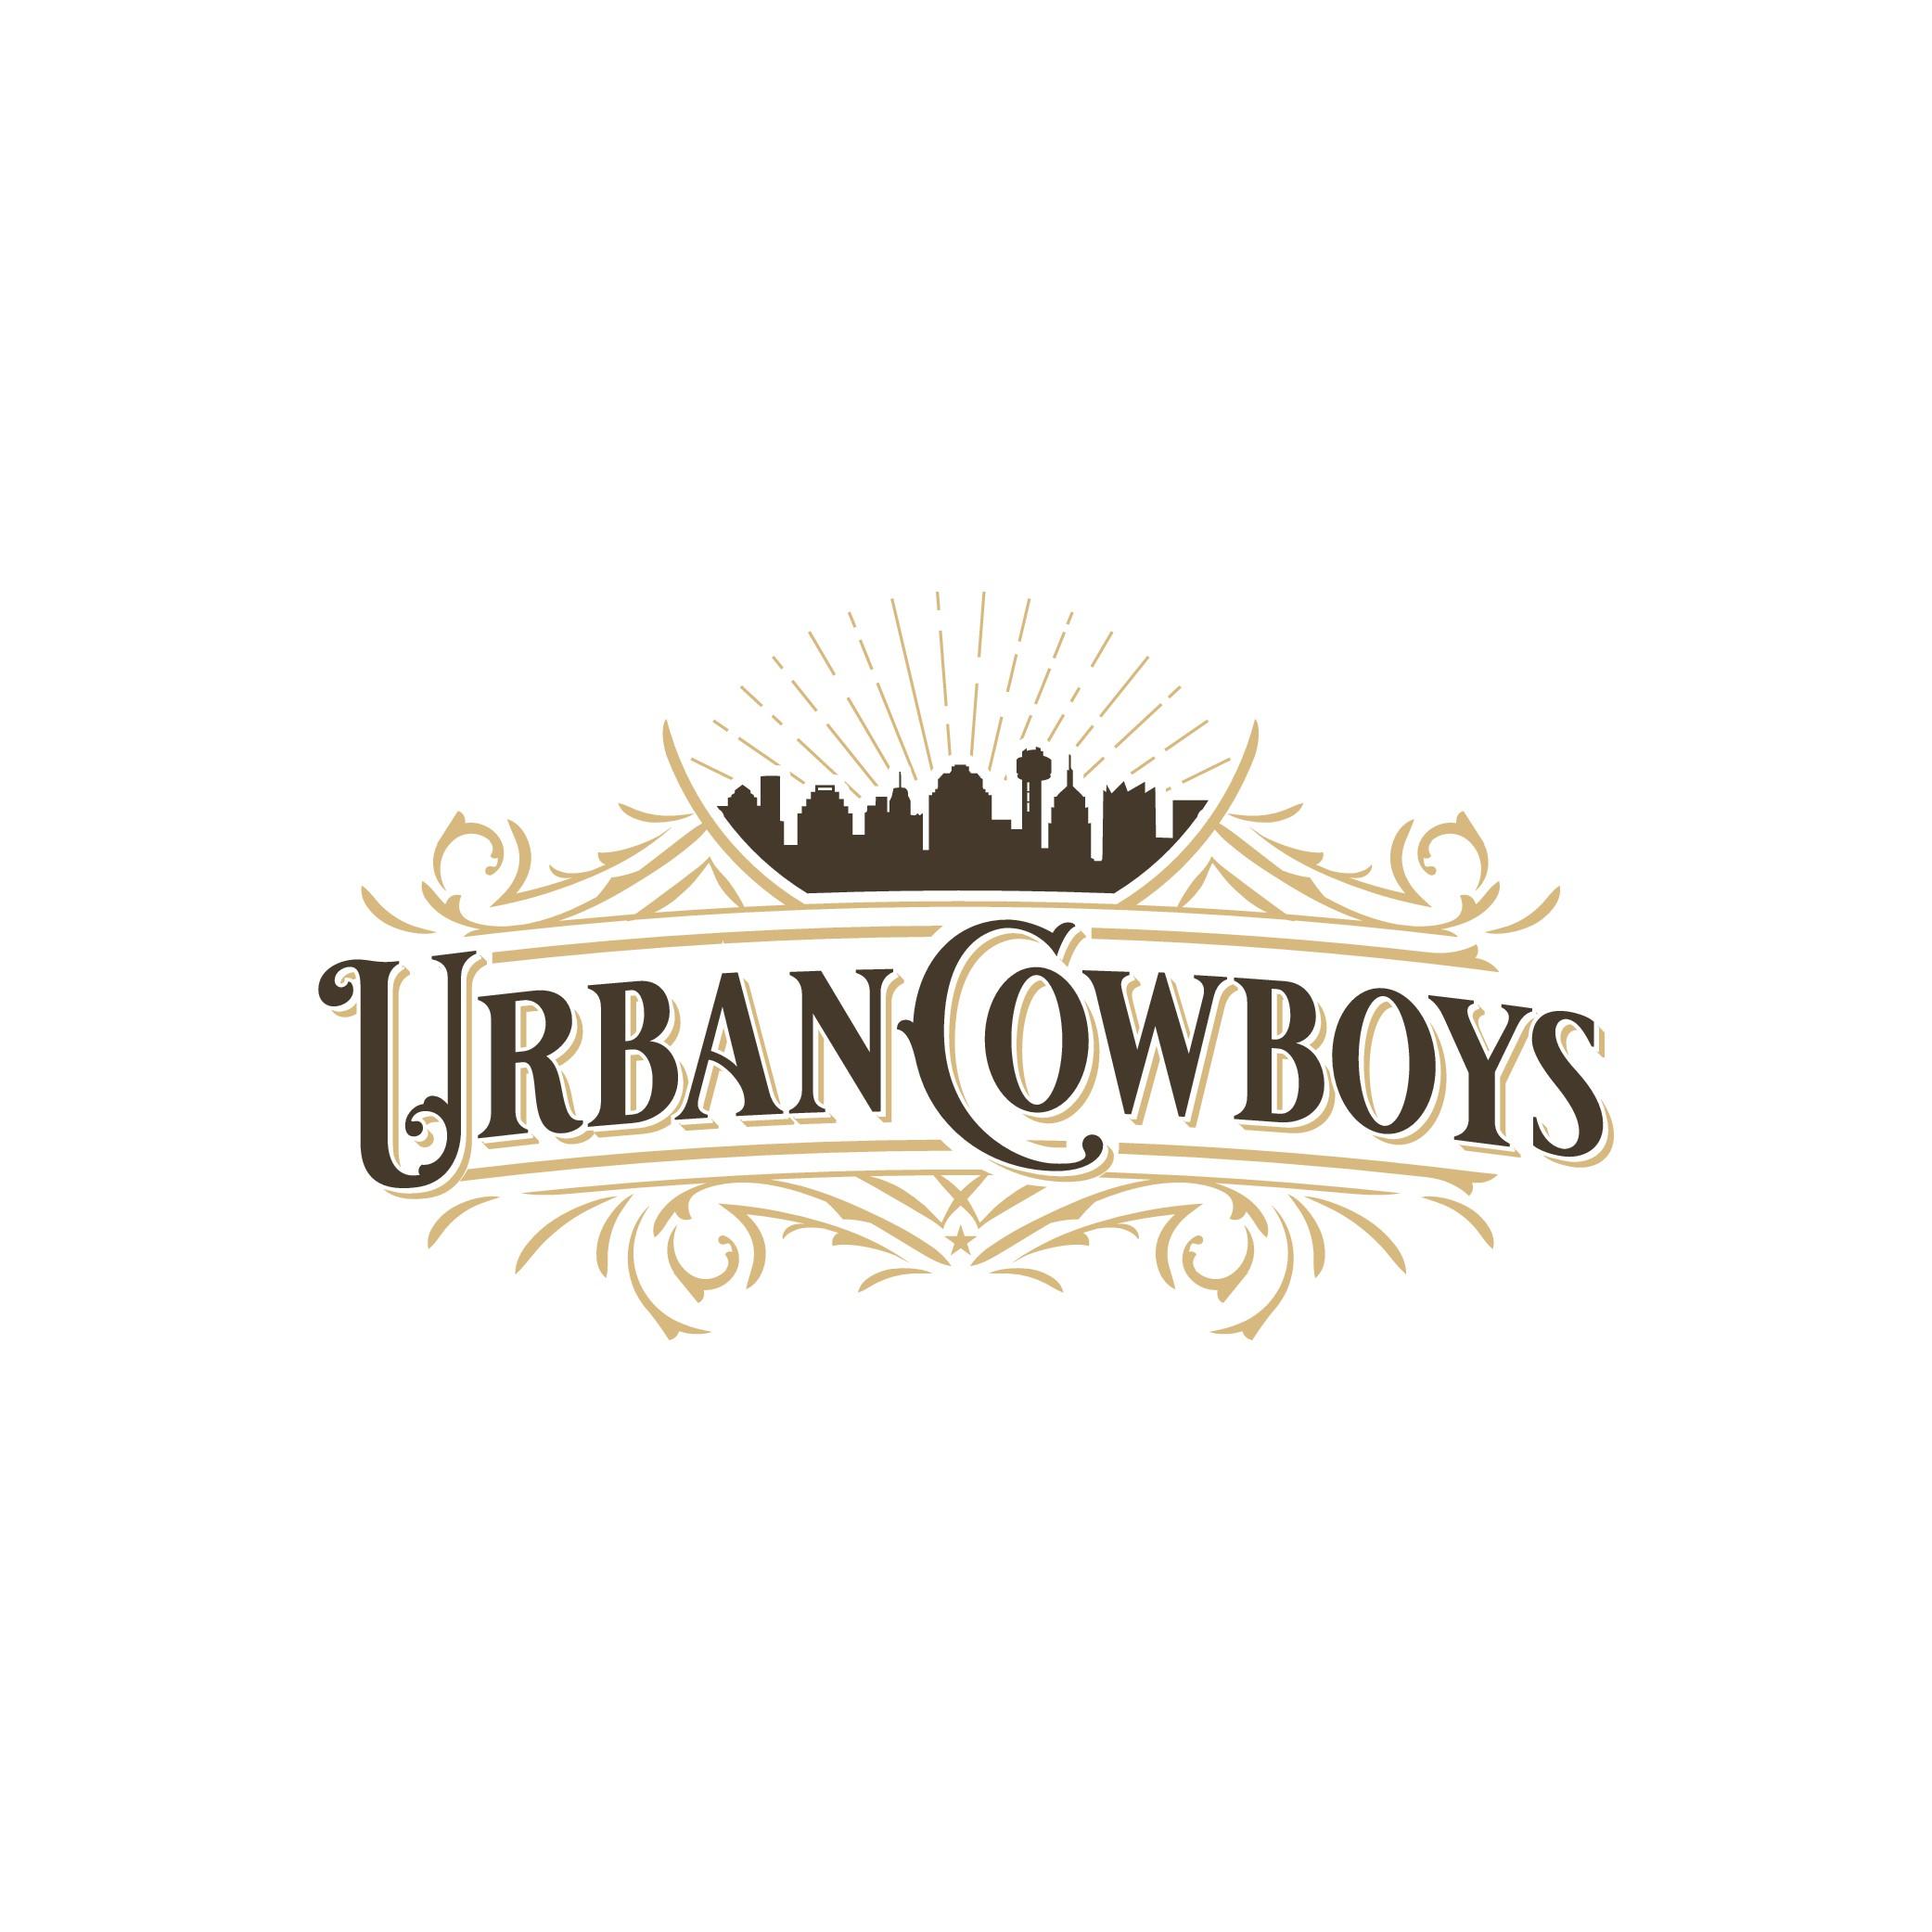 Urban Cowboys Country Band Logo